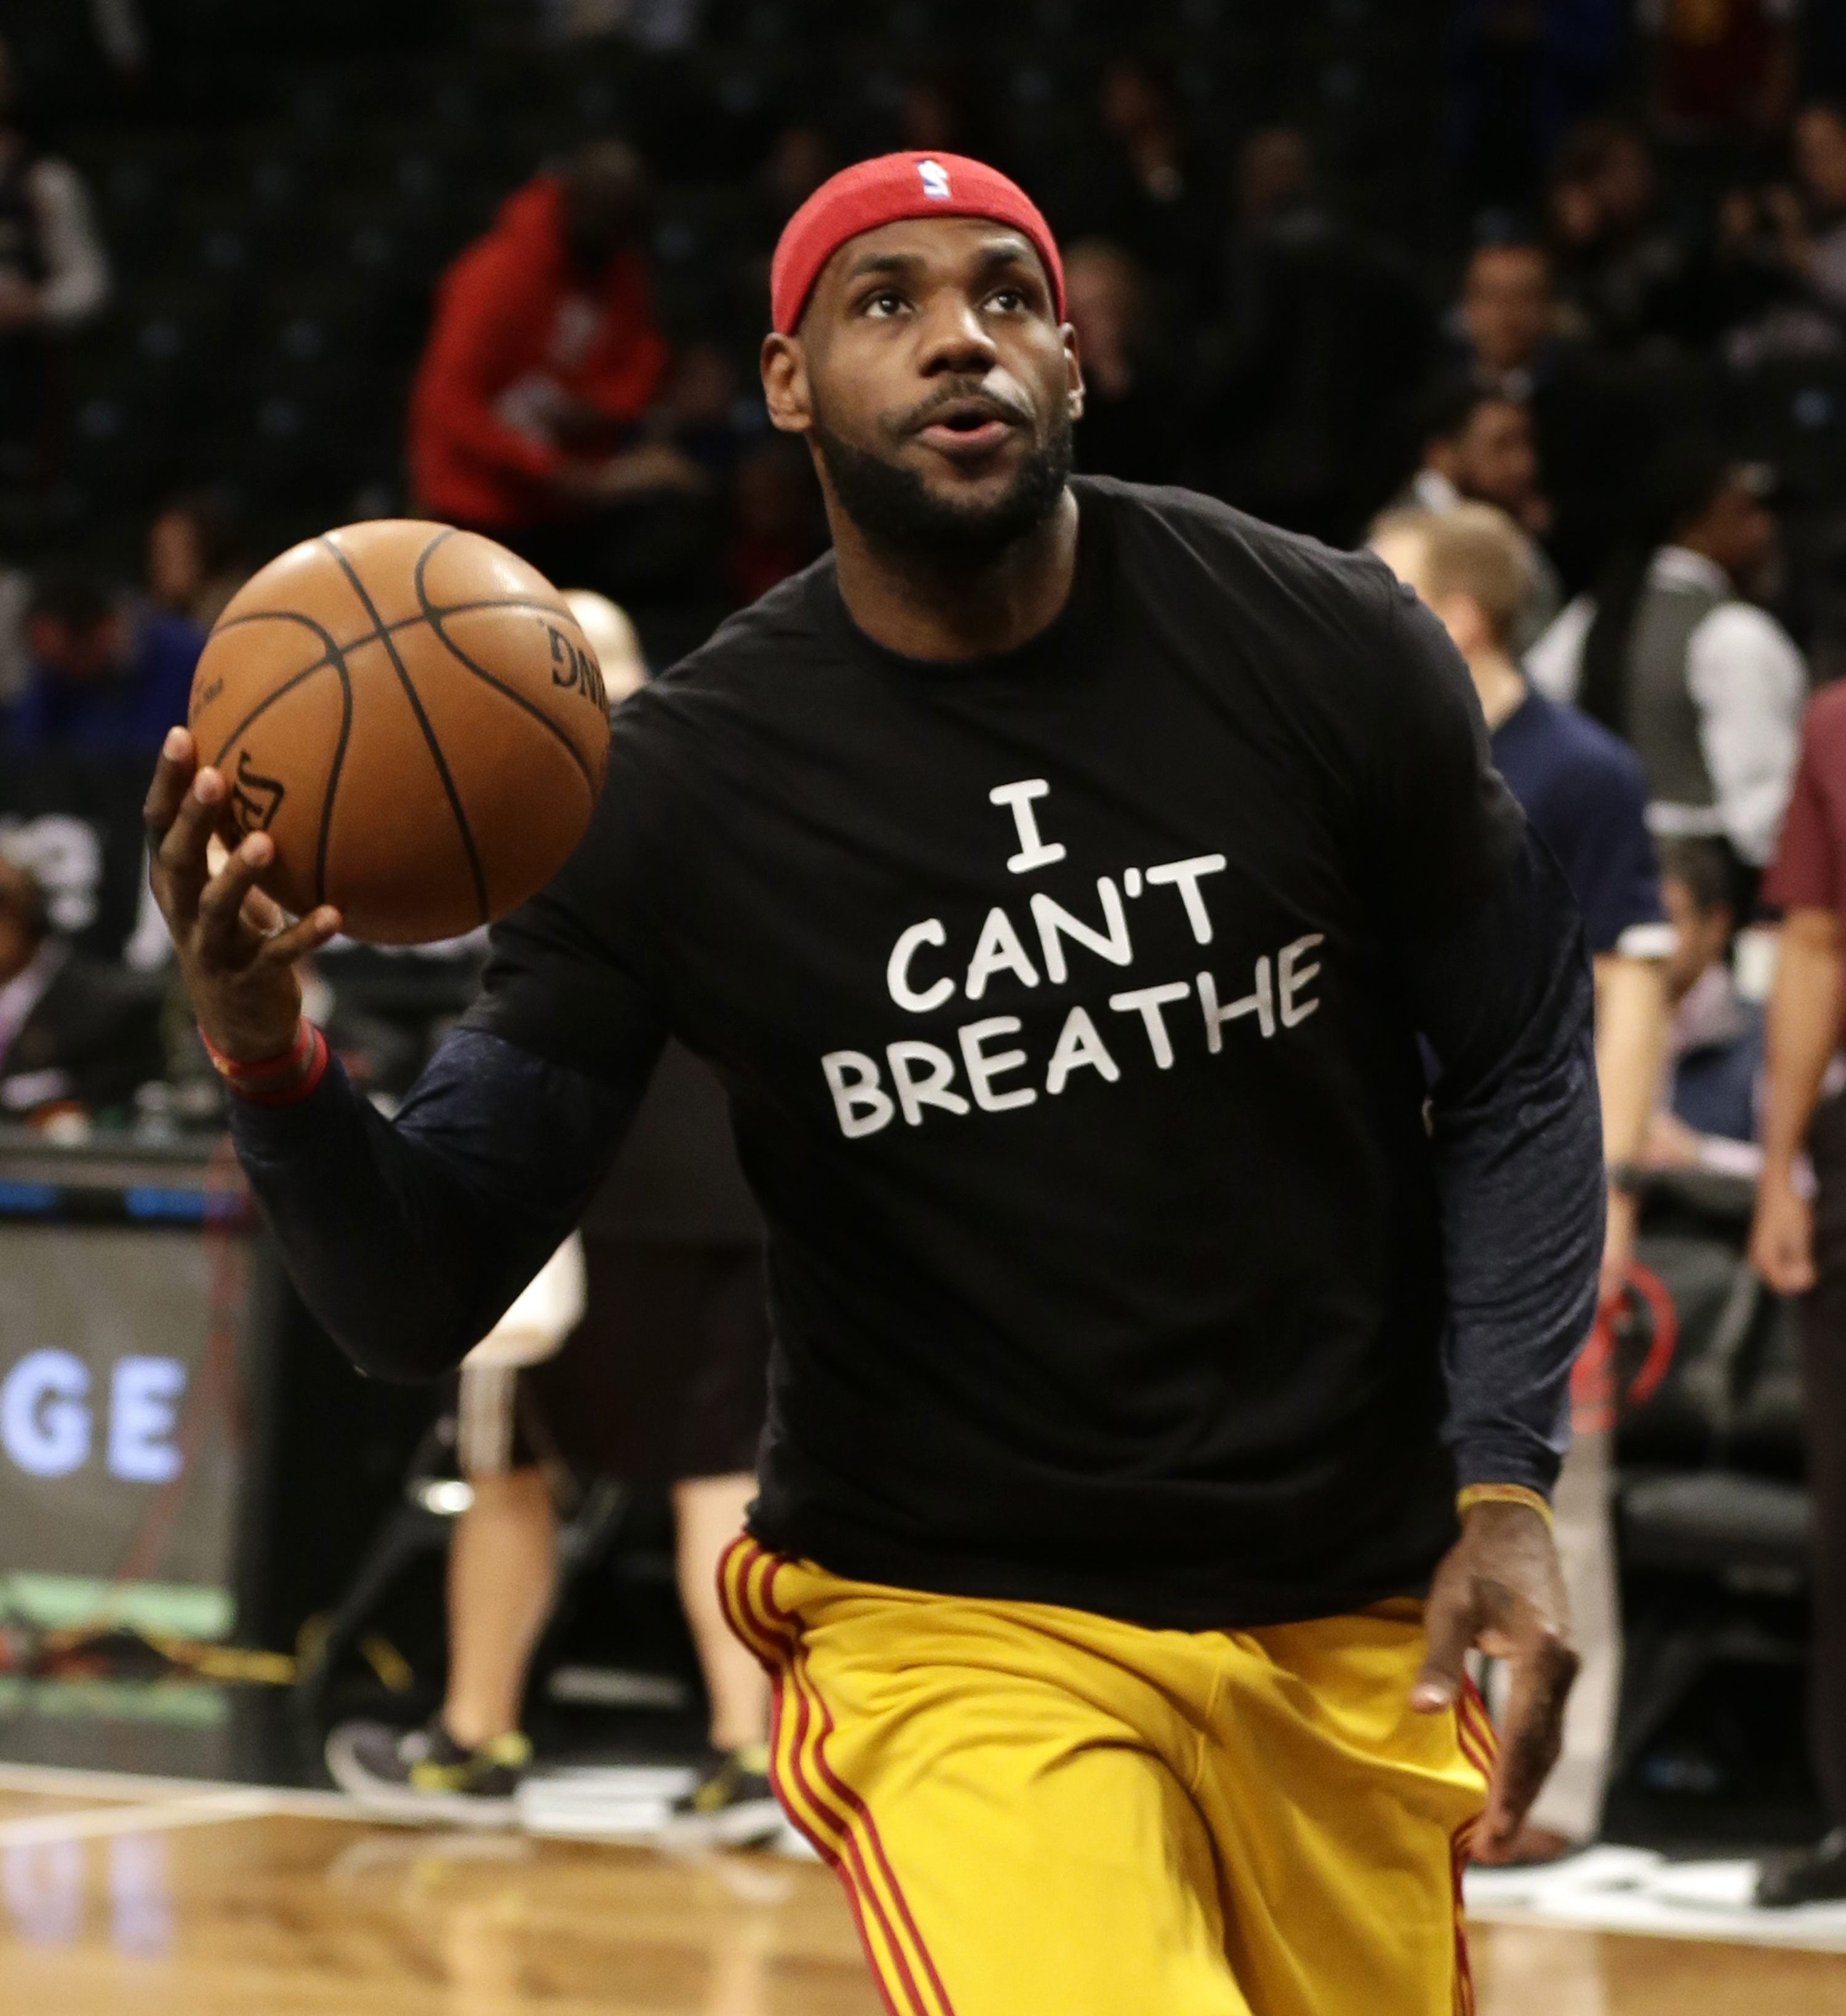 Cleveland Cavaliers forward LeBron James in Brooklyn, New York on Dec. 8, 2014.